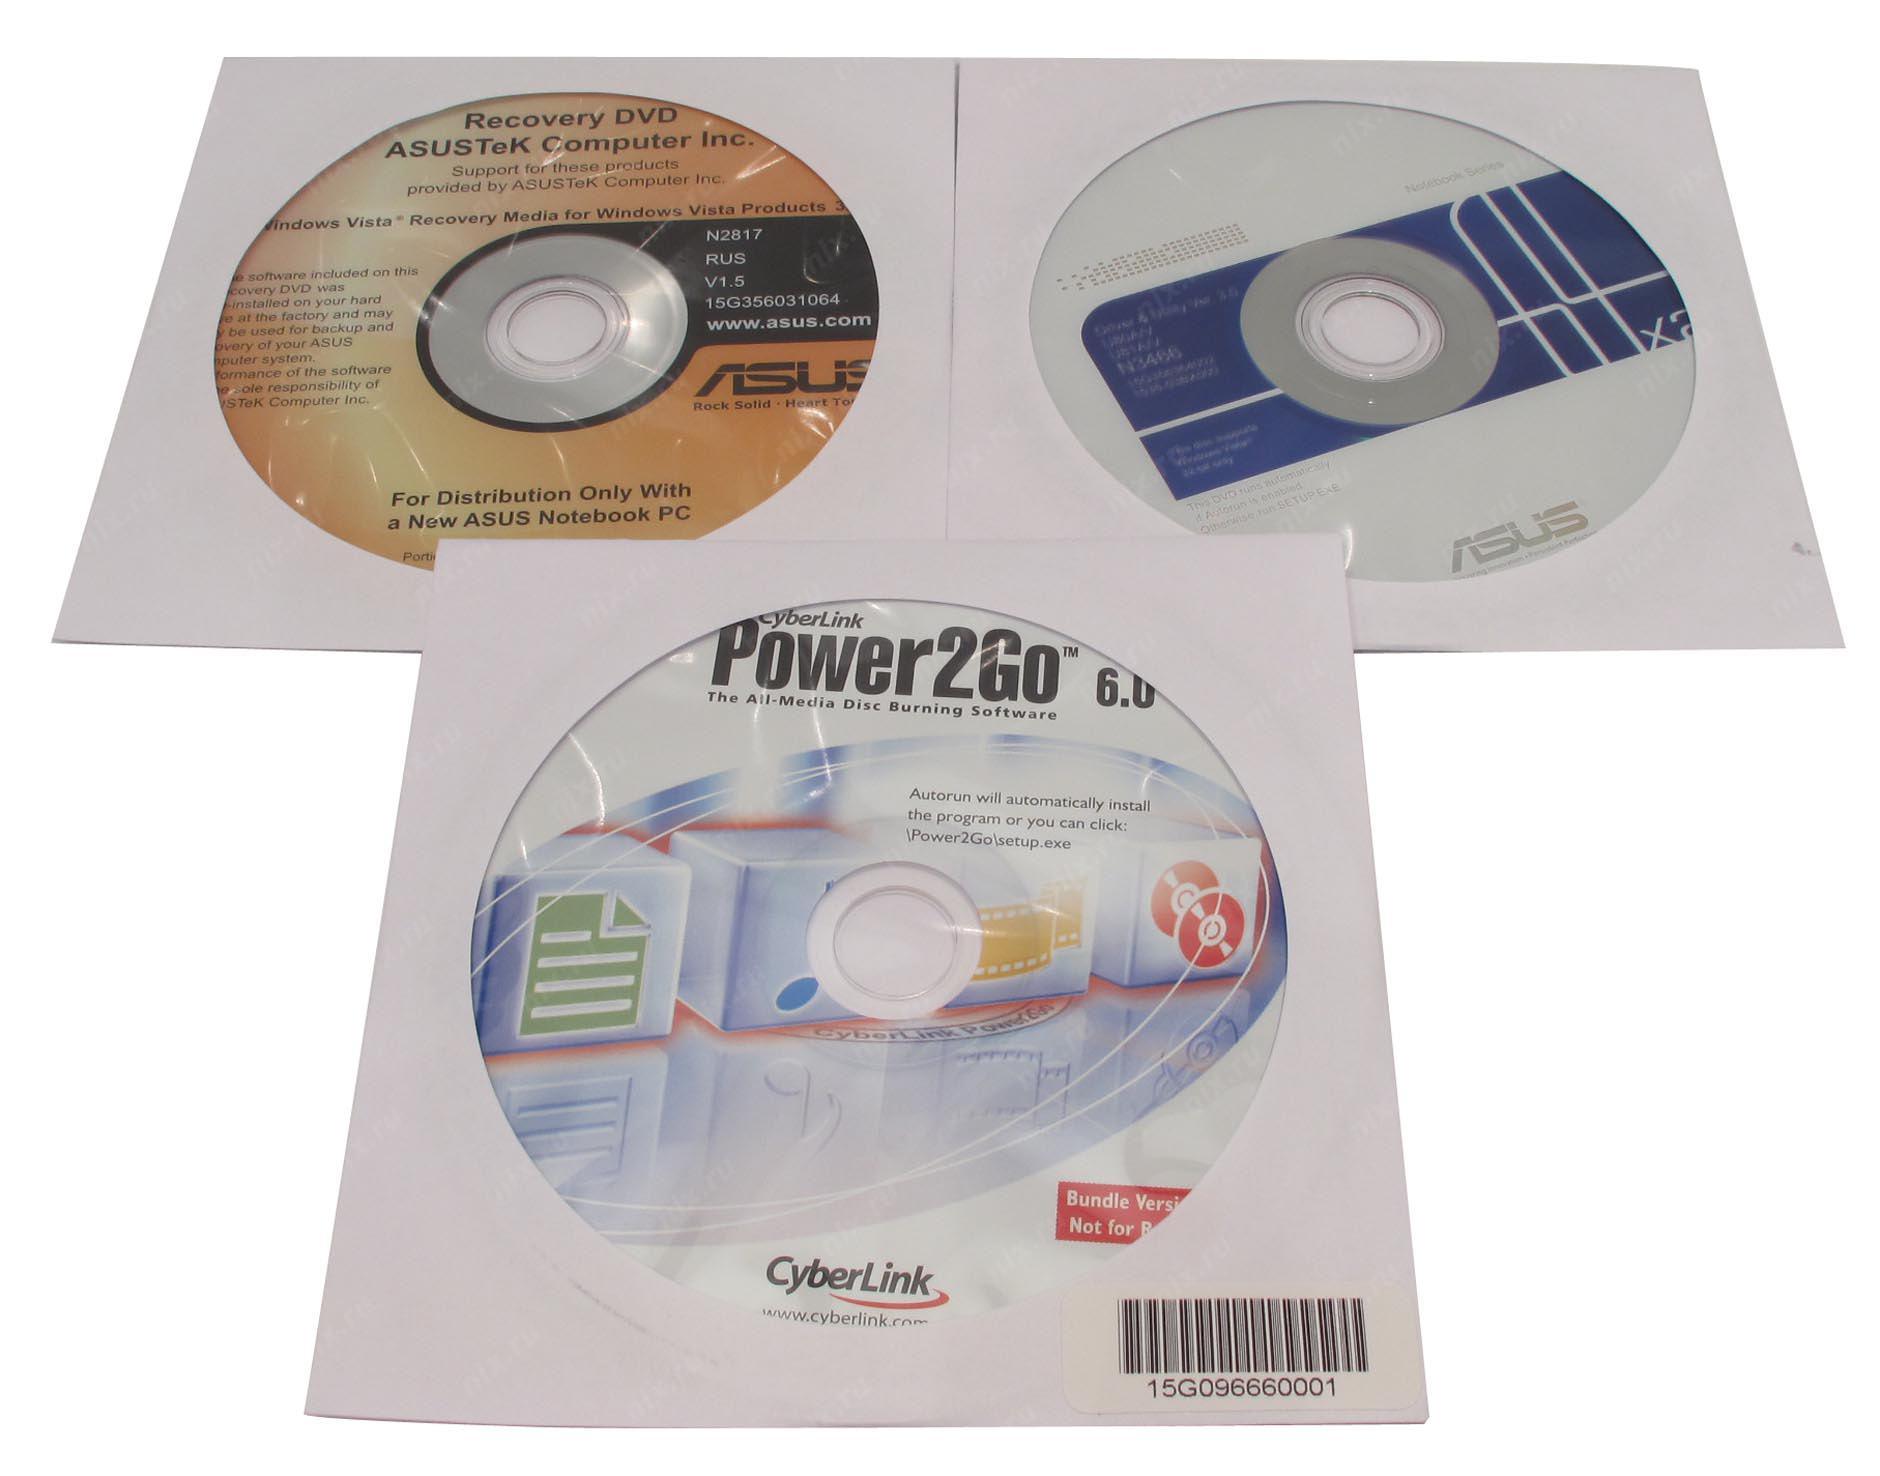 power2g0